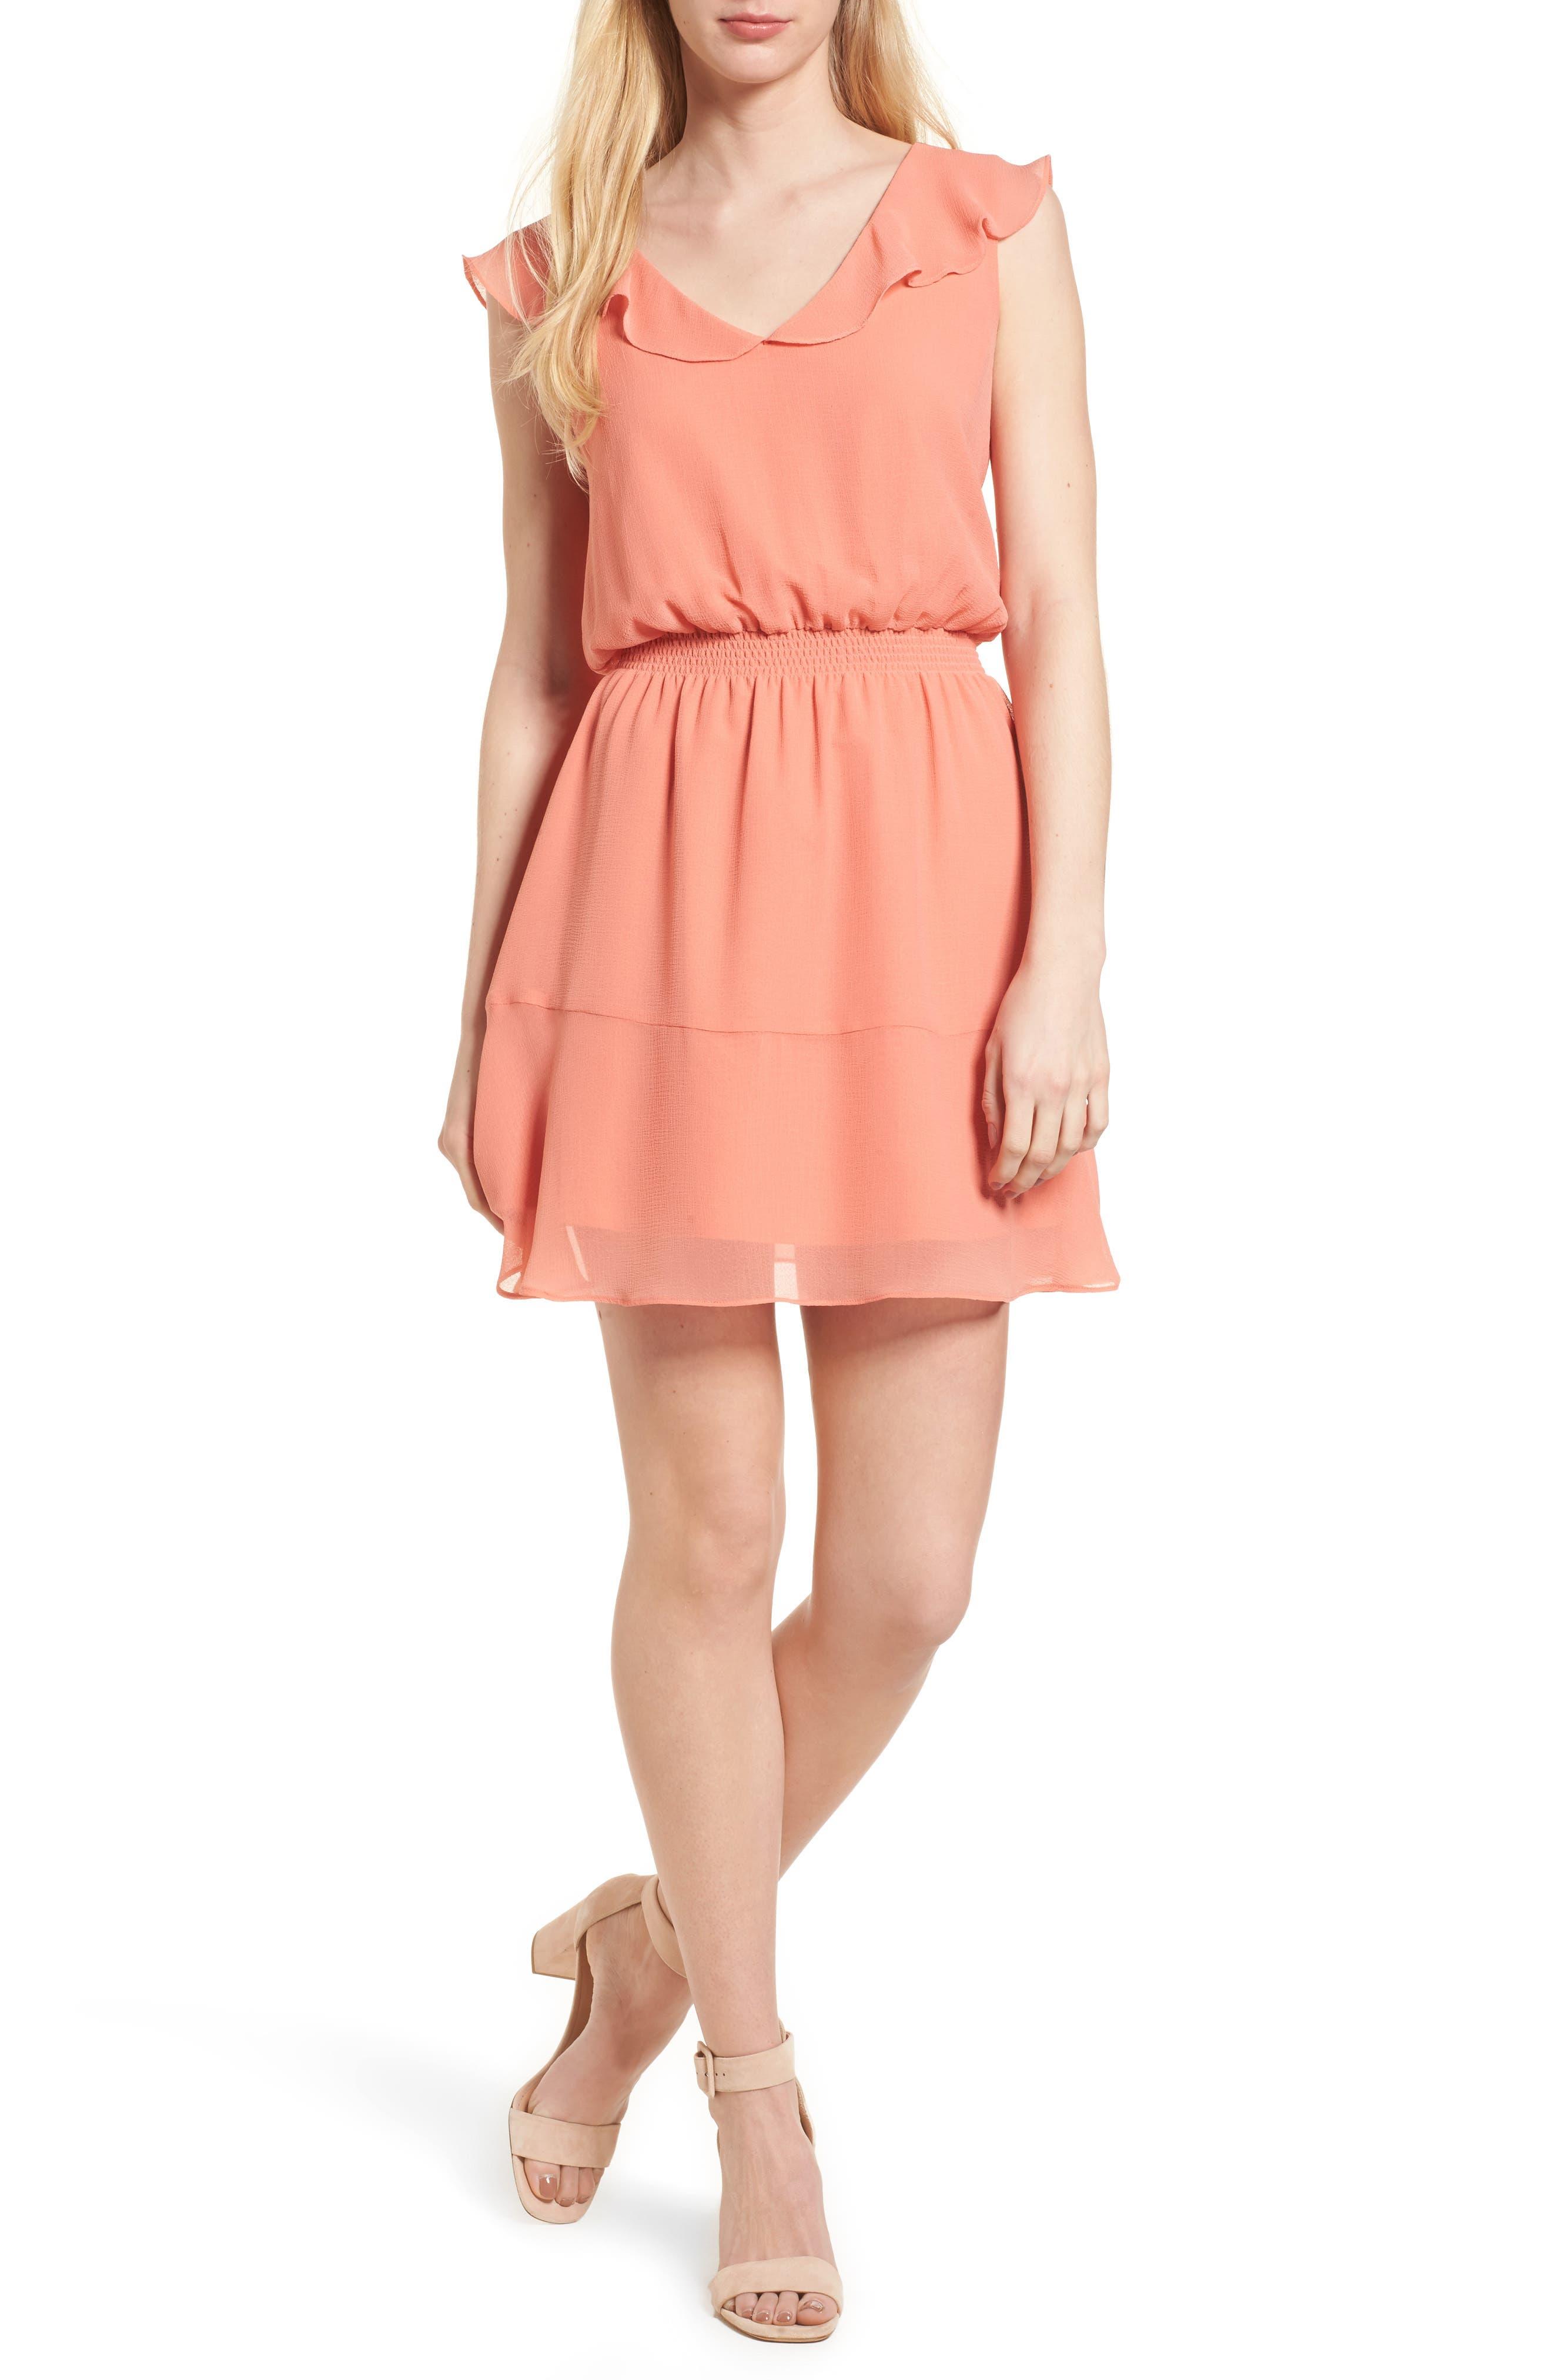 Iniko Blouson Dress,                         Main,                         color, Spring Coral